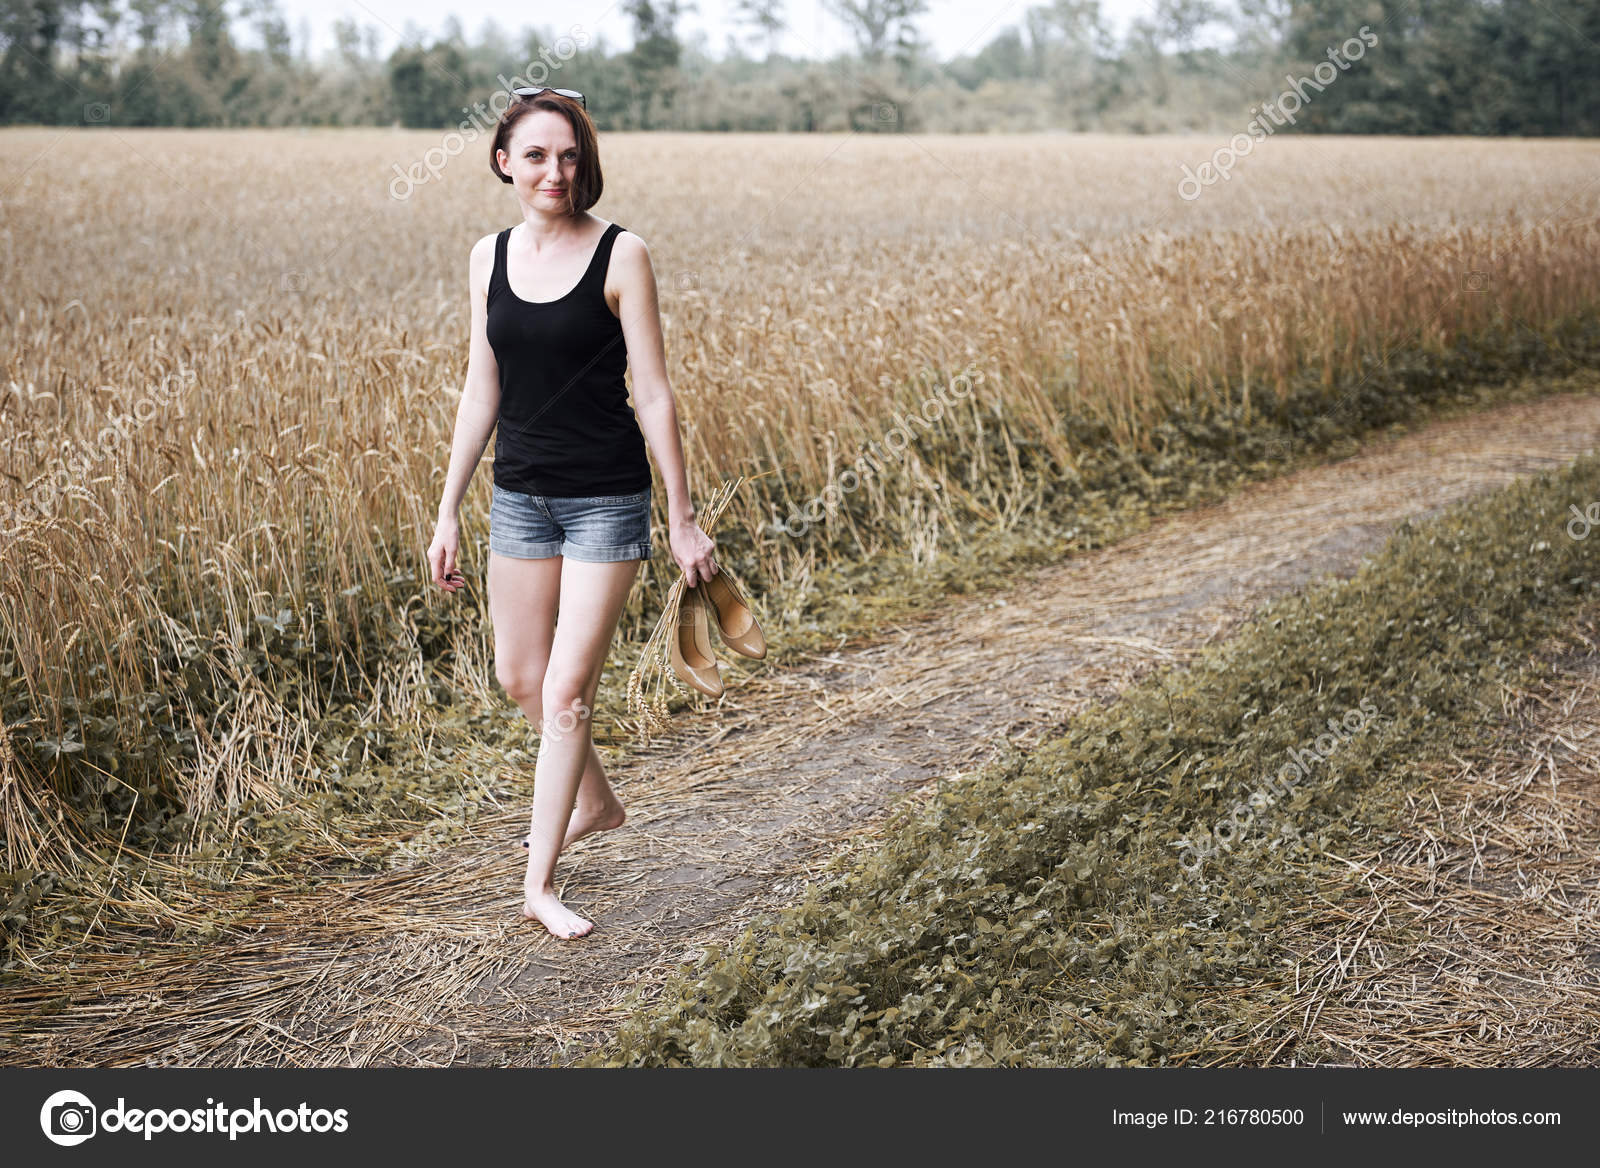 https://st4.depositphotos.com/1719616/21678/i/1600/depositphotos_216780500-stock-photo-young-girl-walking-barefoot-ground.jpg